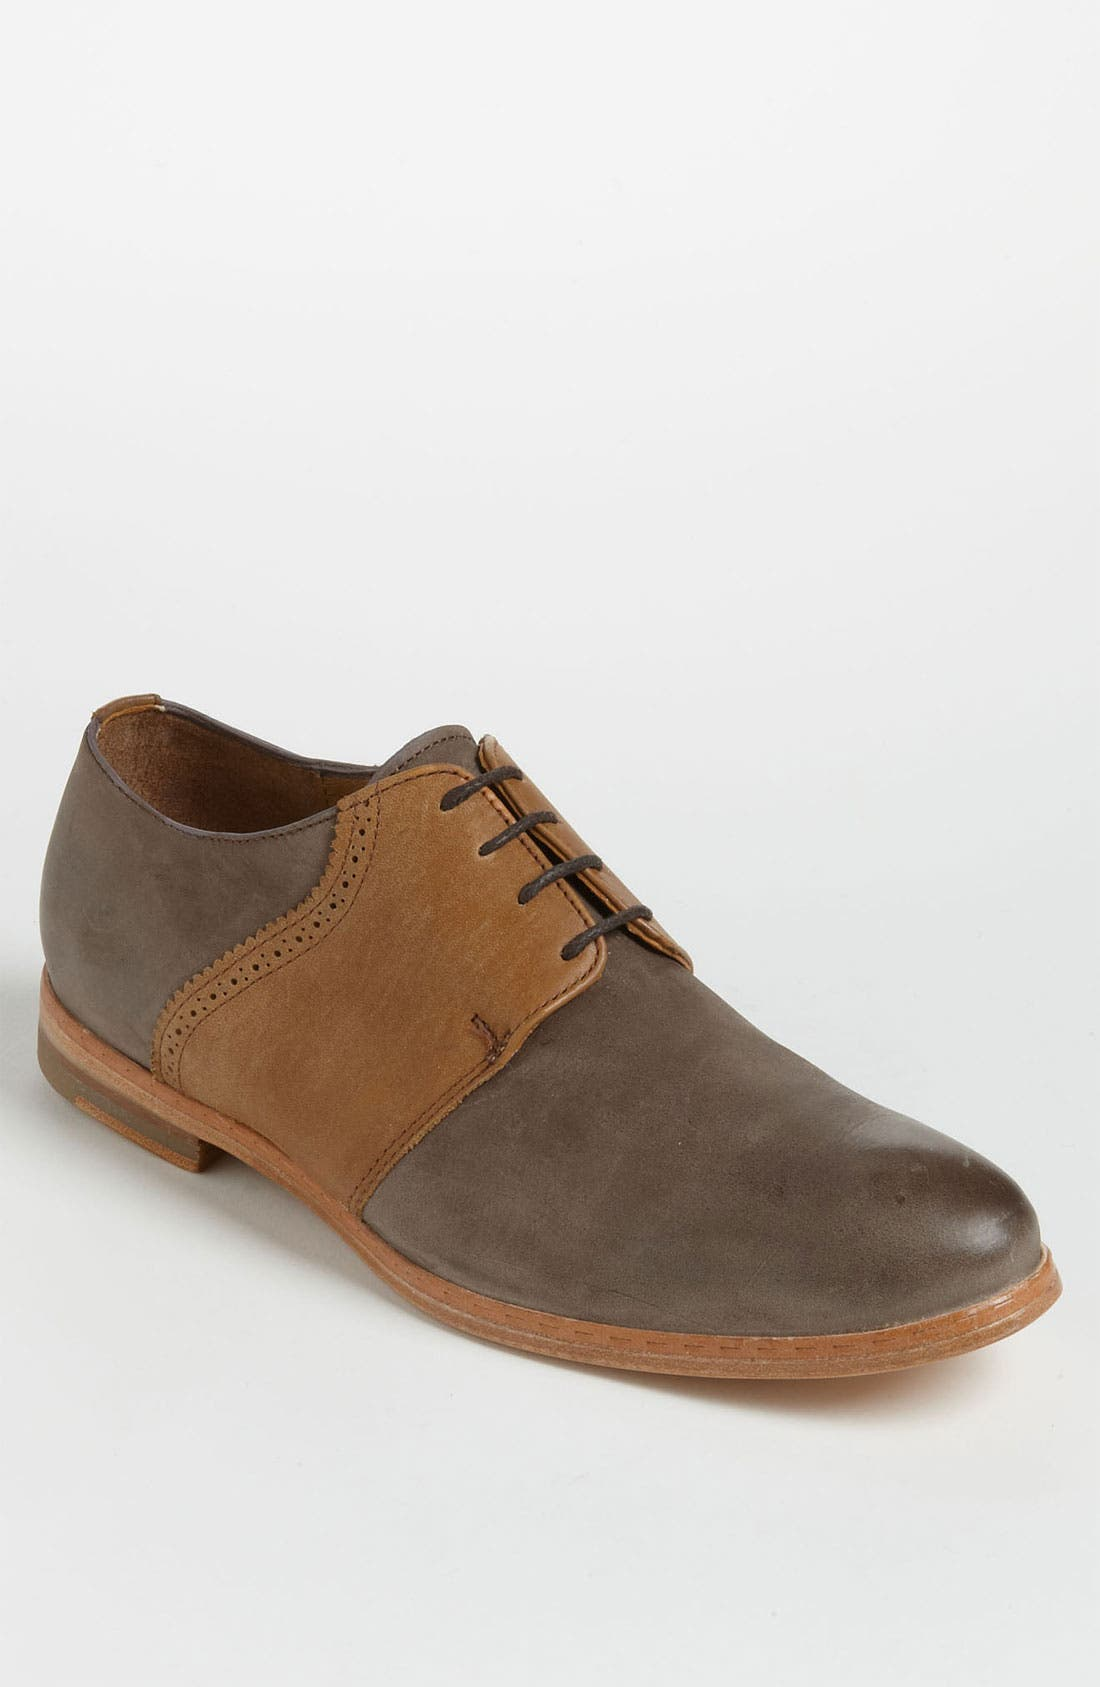 Alternate Image 1 Selected - J.D. Fisk 'Mosimo' Saddle Shoe